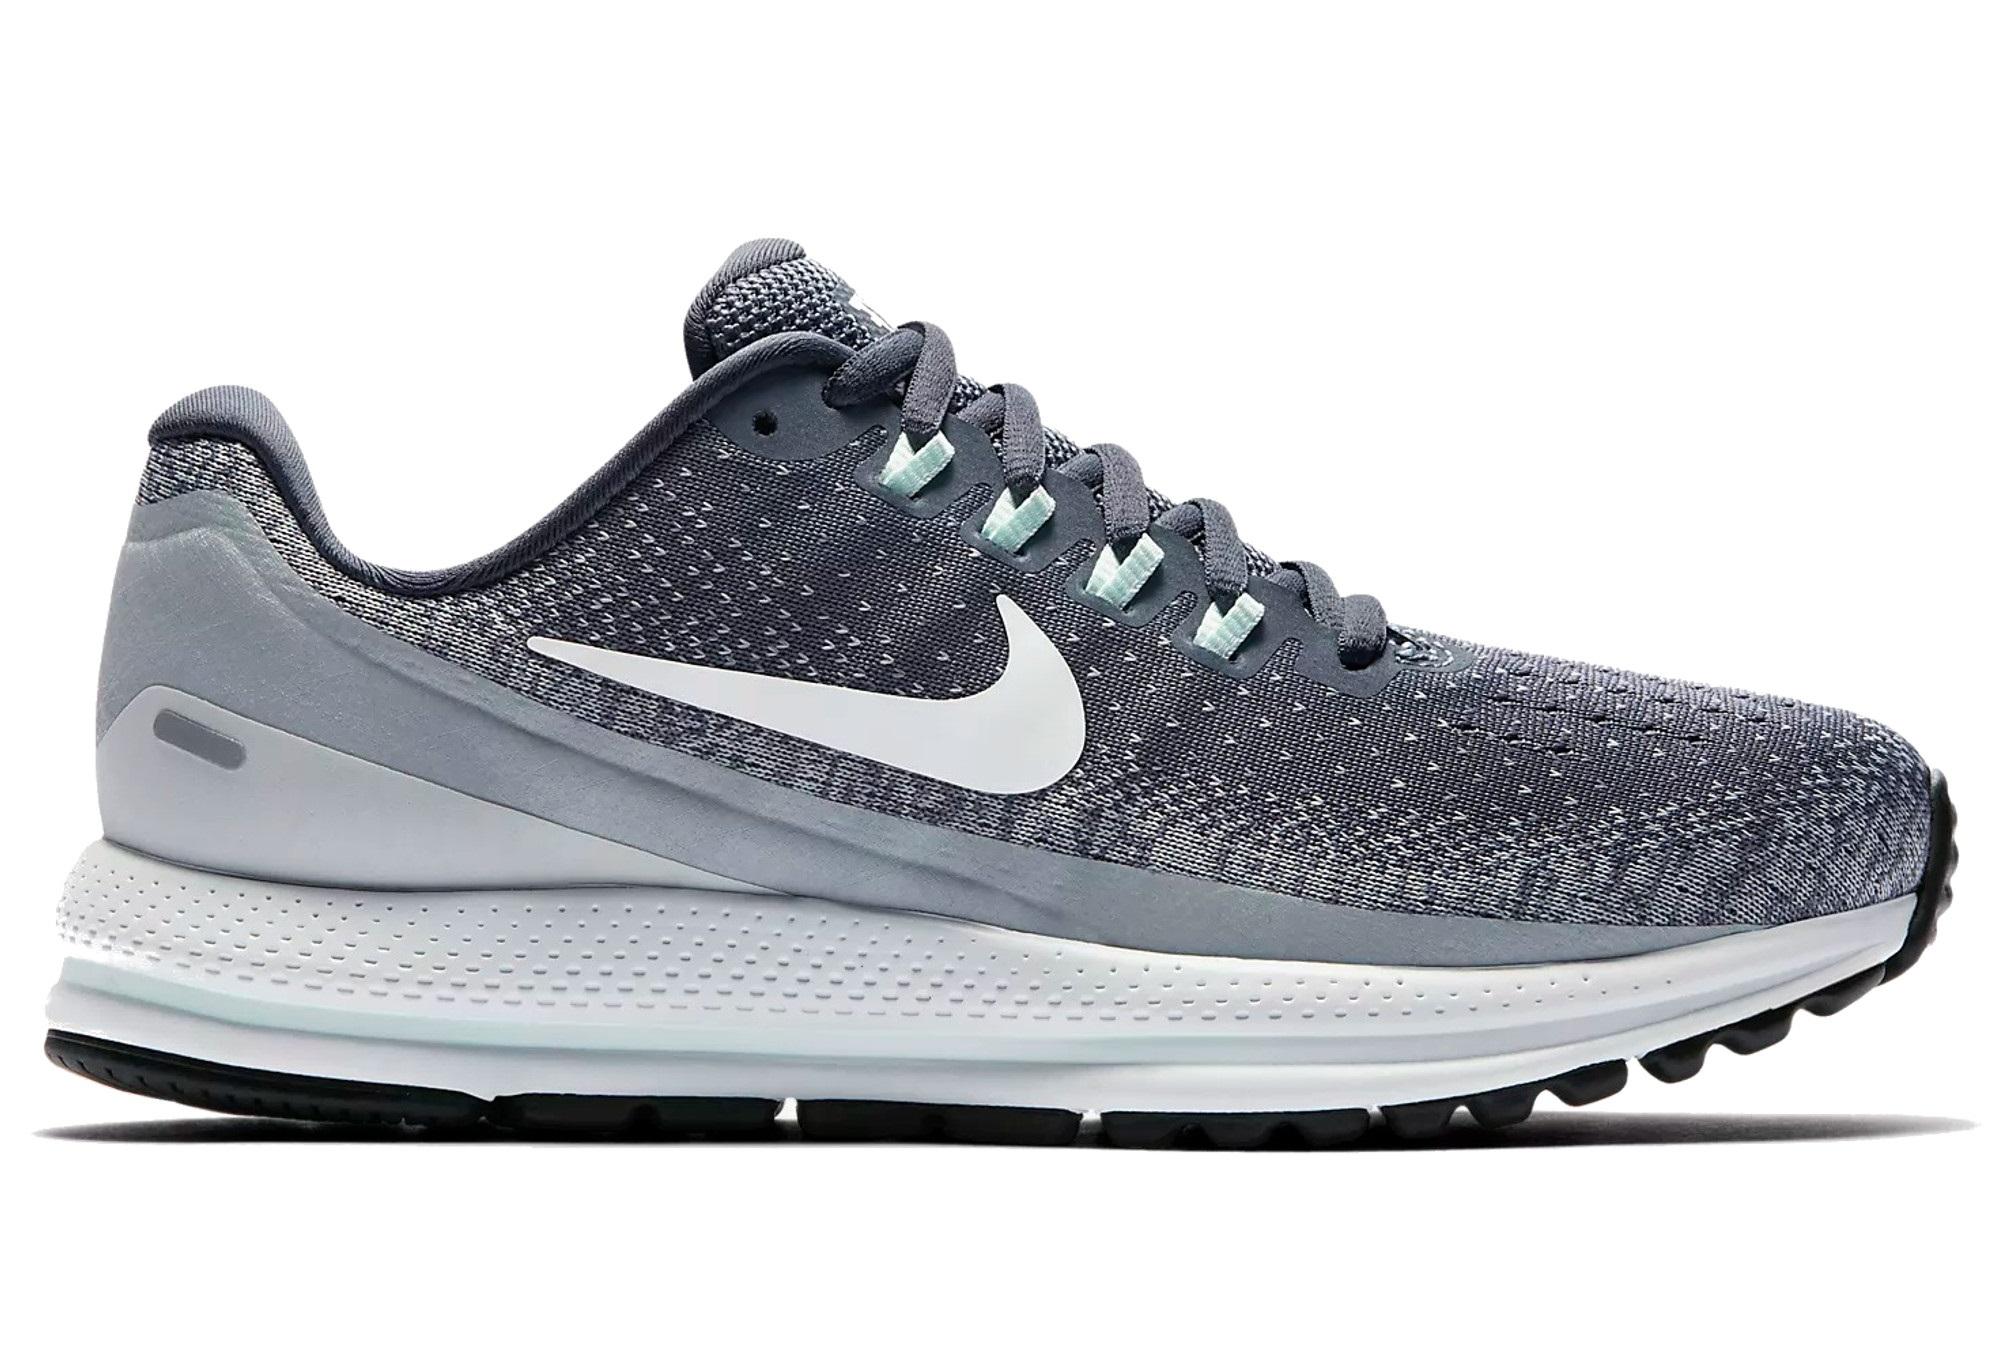 Zoom 13 Nike Air Schwarz Schuhe Vomero Damen Grau Weiß OPnN80ZwXk